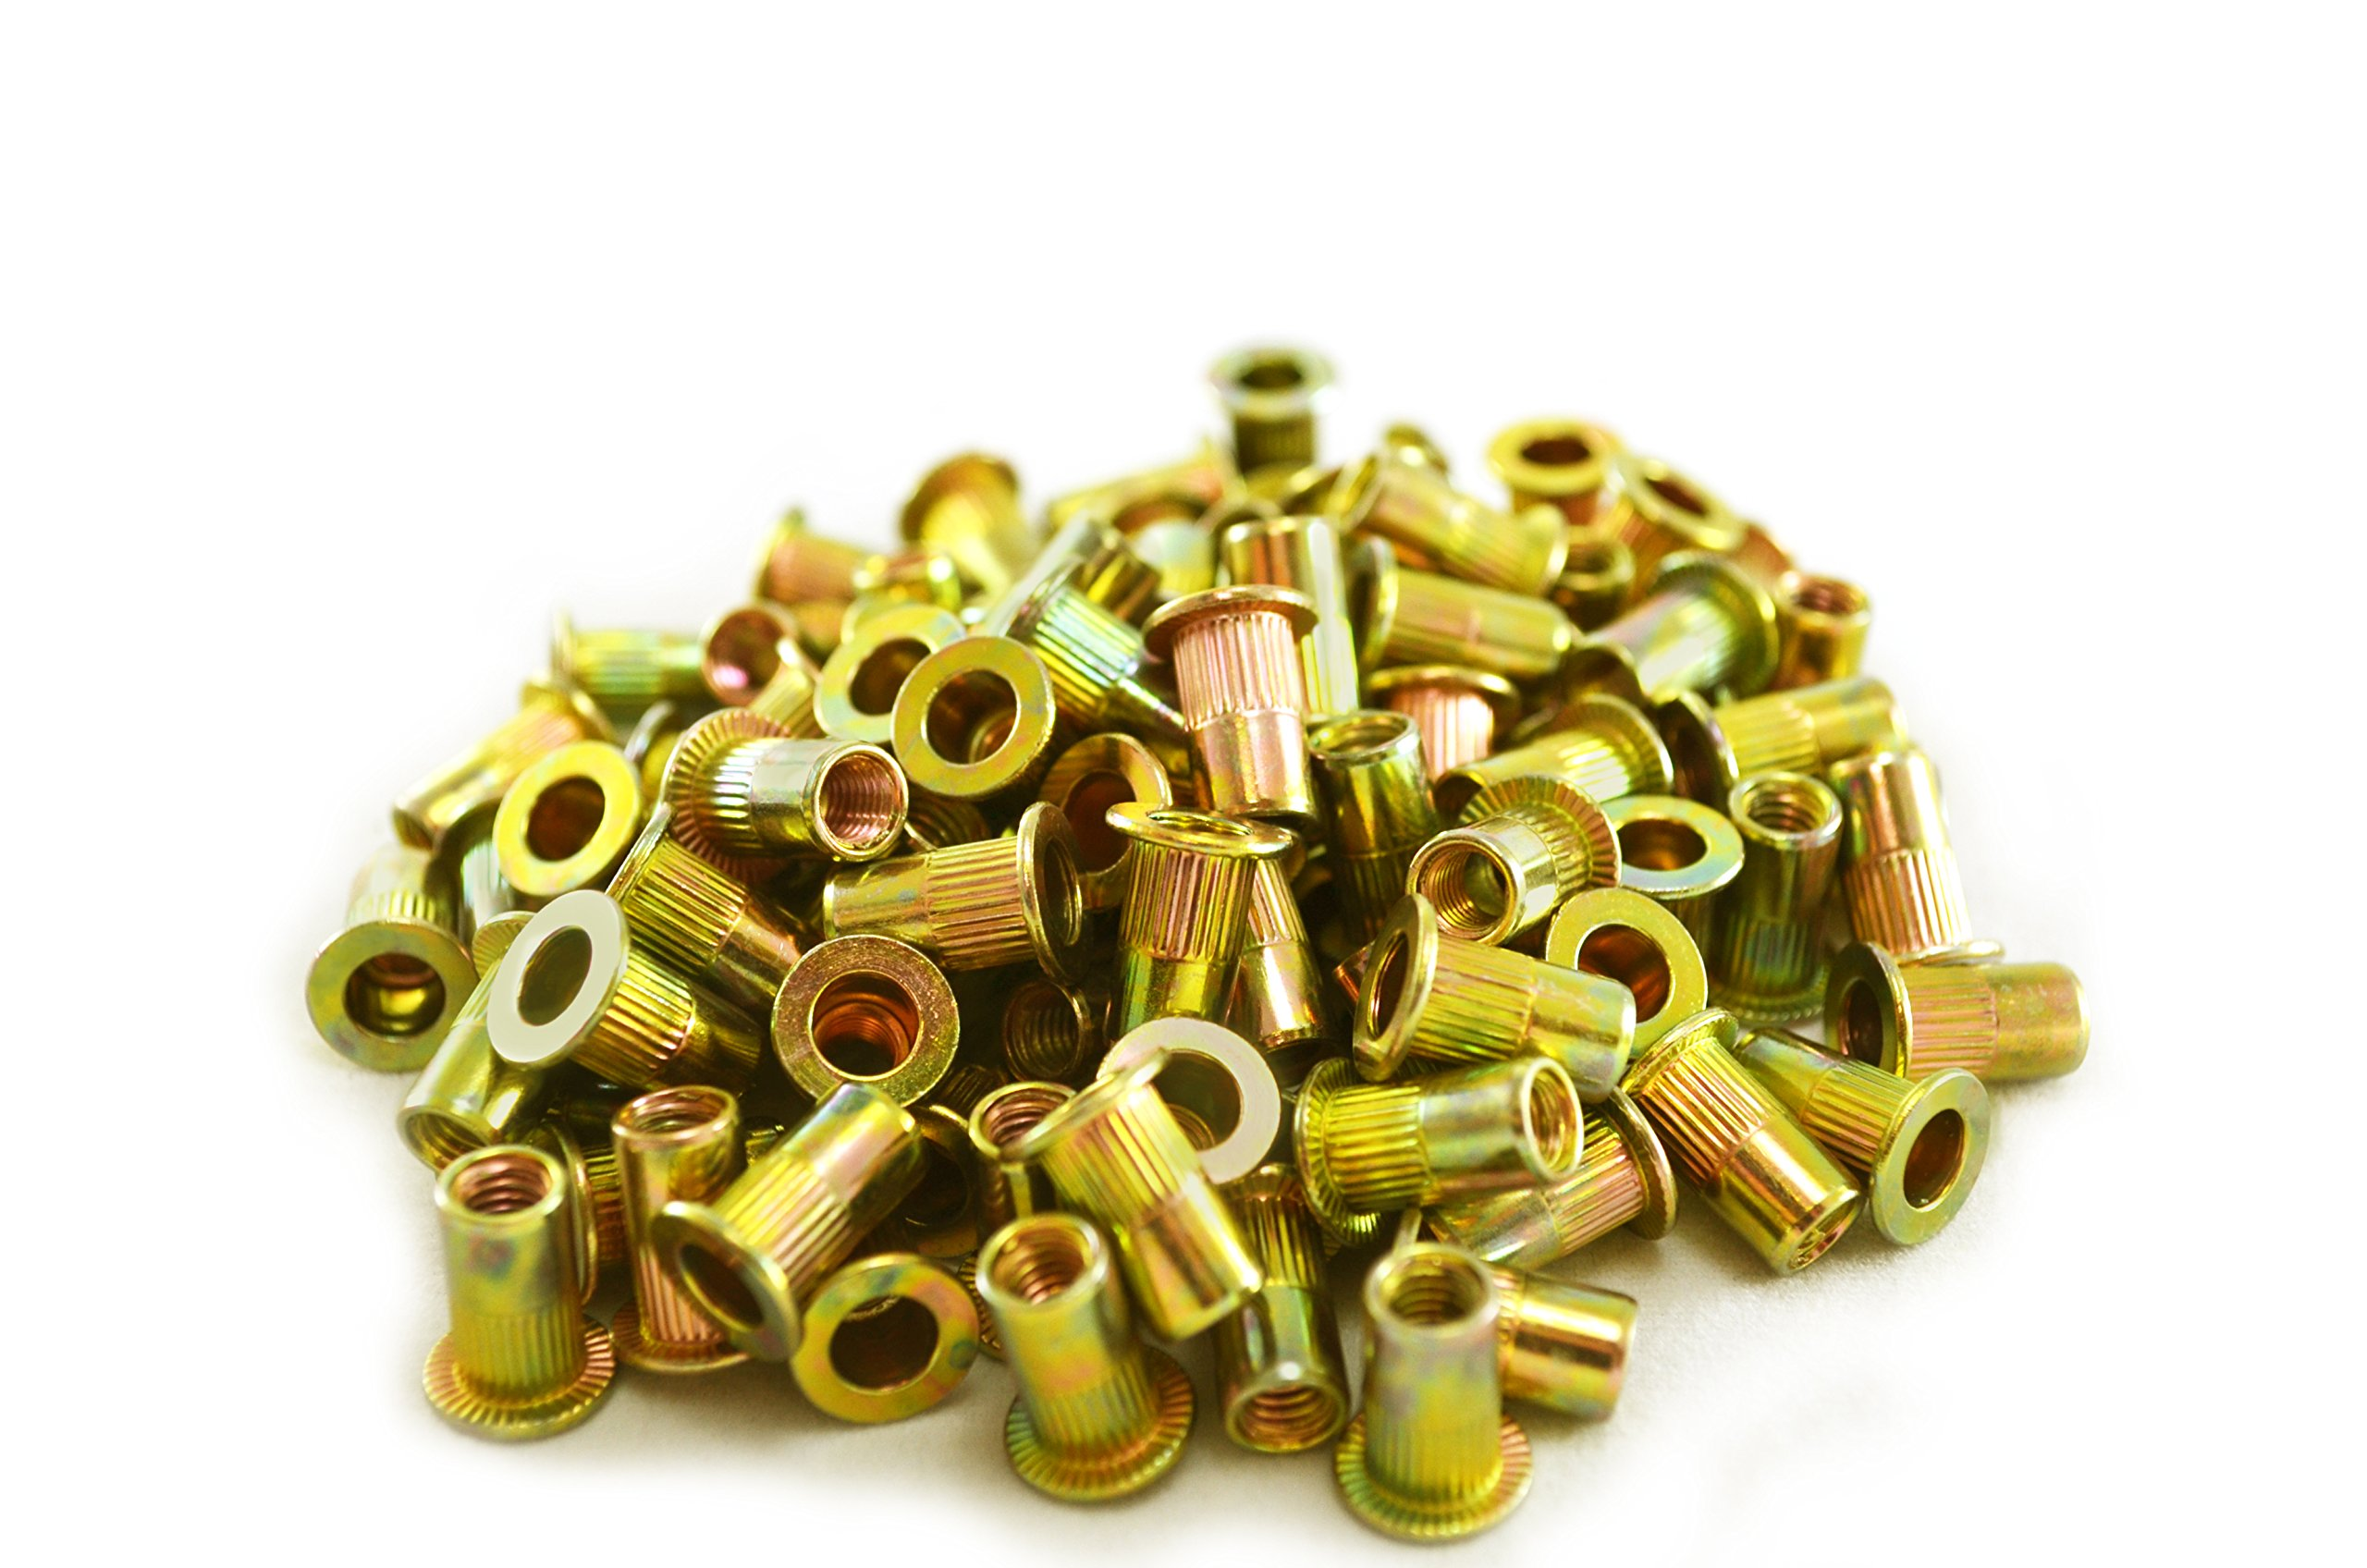 Astro Pneumatic Tool RN5M M5 5mm Steel Rivet Nuts (100 Piece)